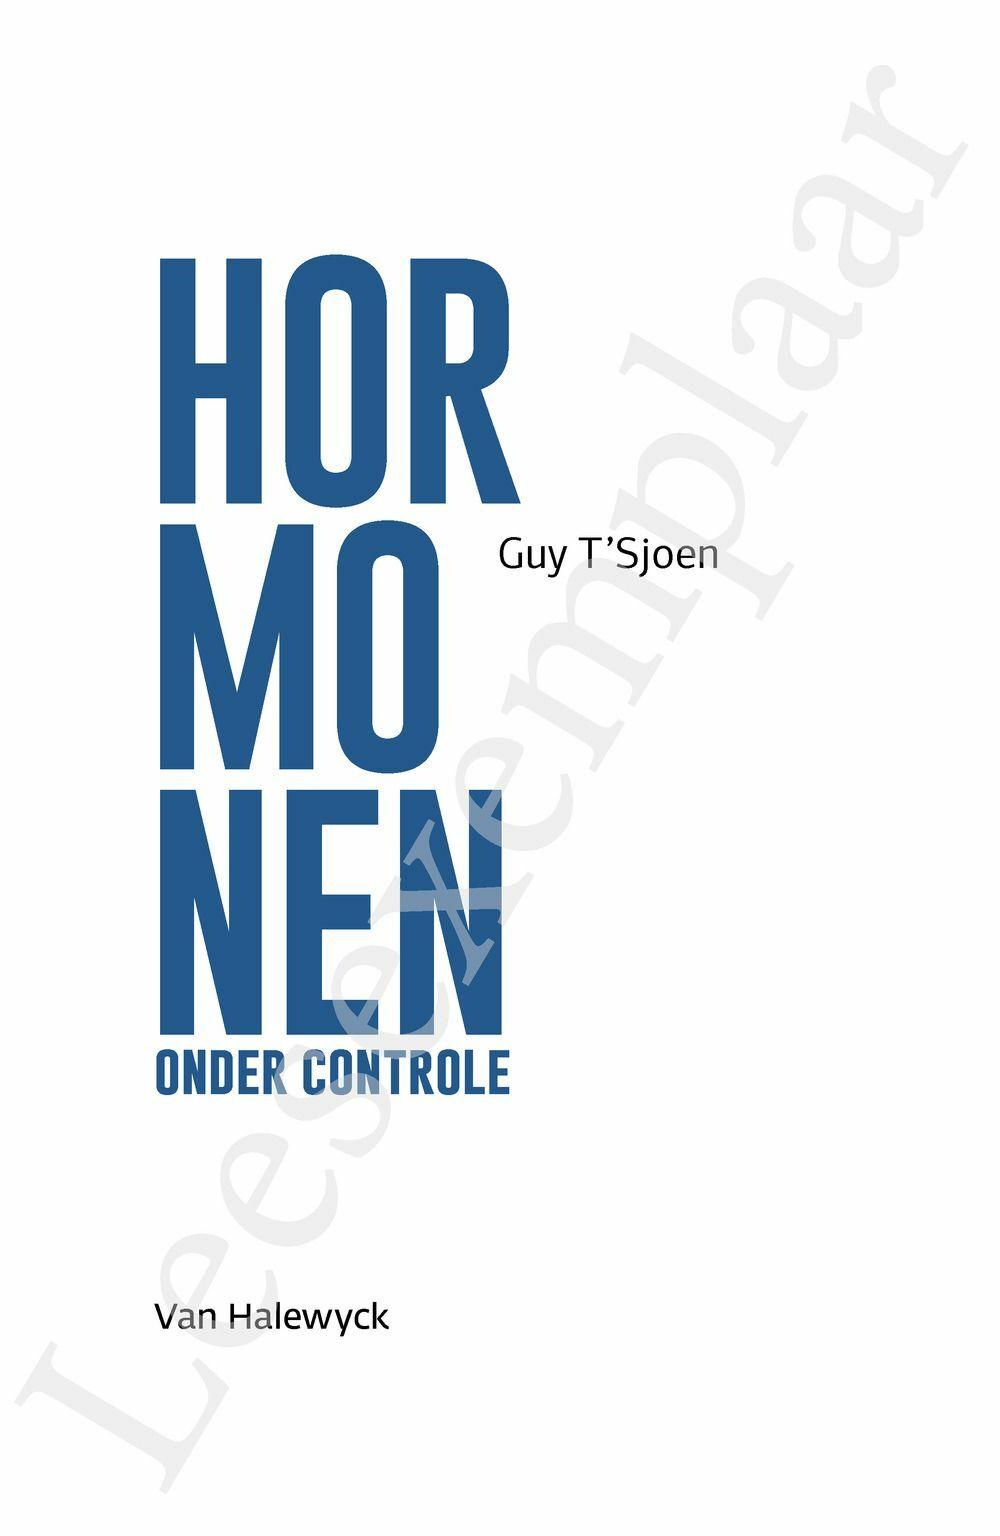 Preview: Hormonen onder controle